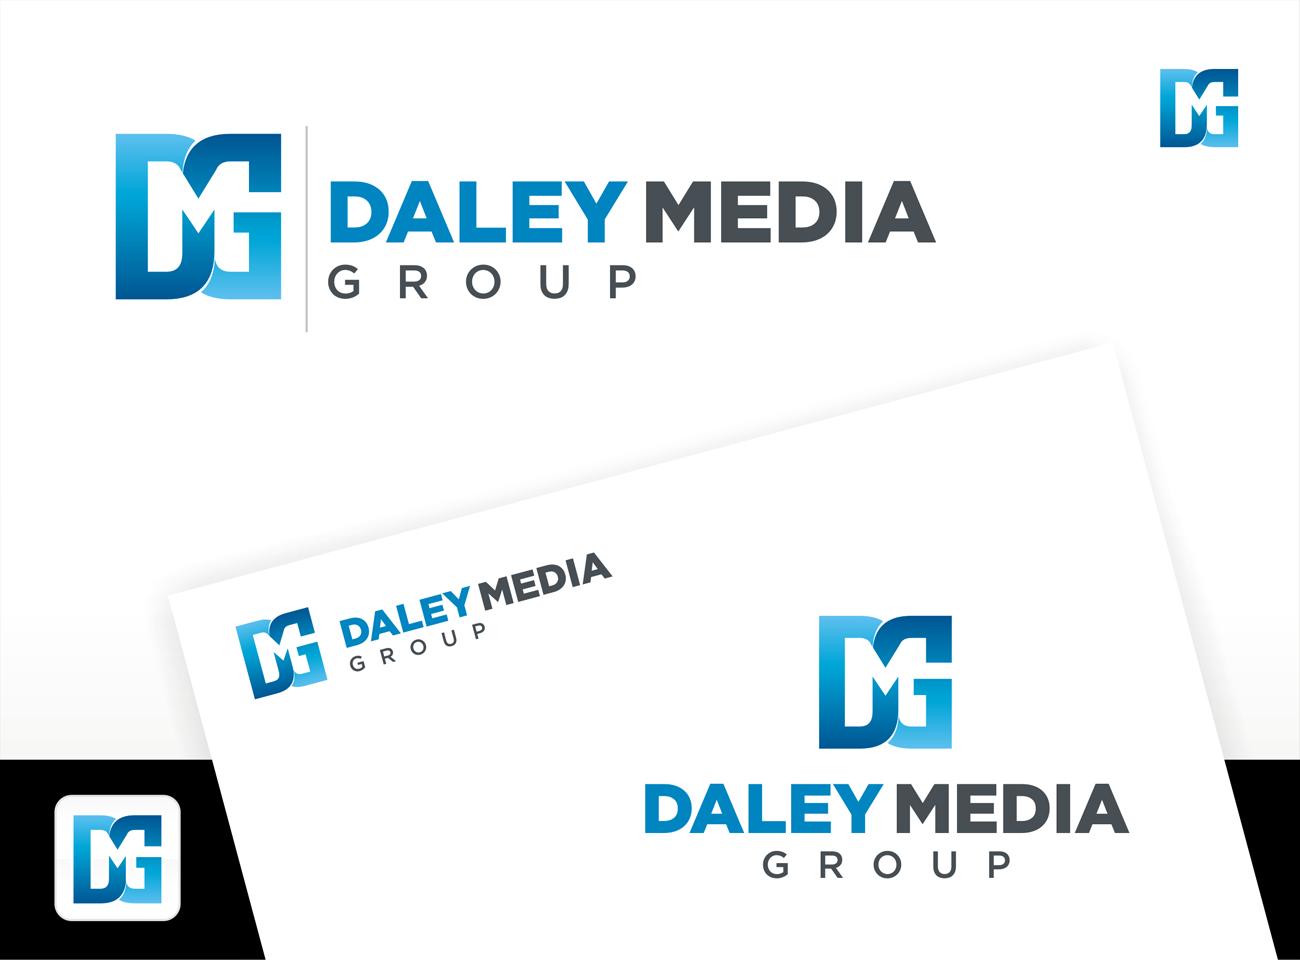 DALEY MEDIA GROUP needs a new logo